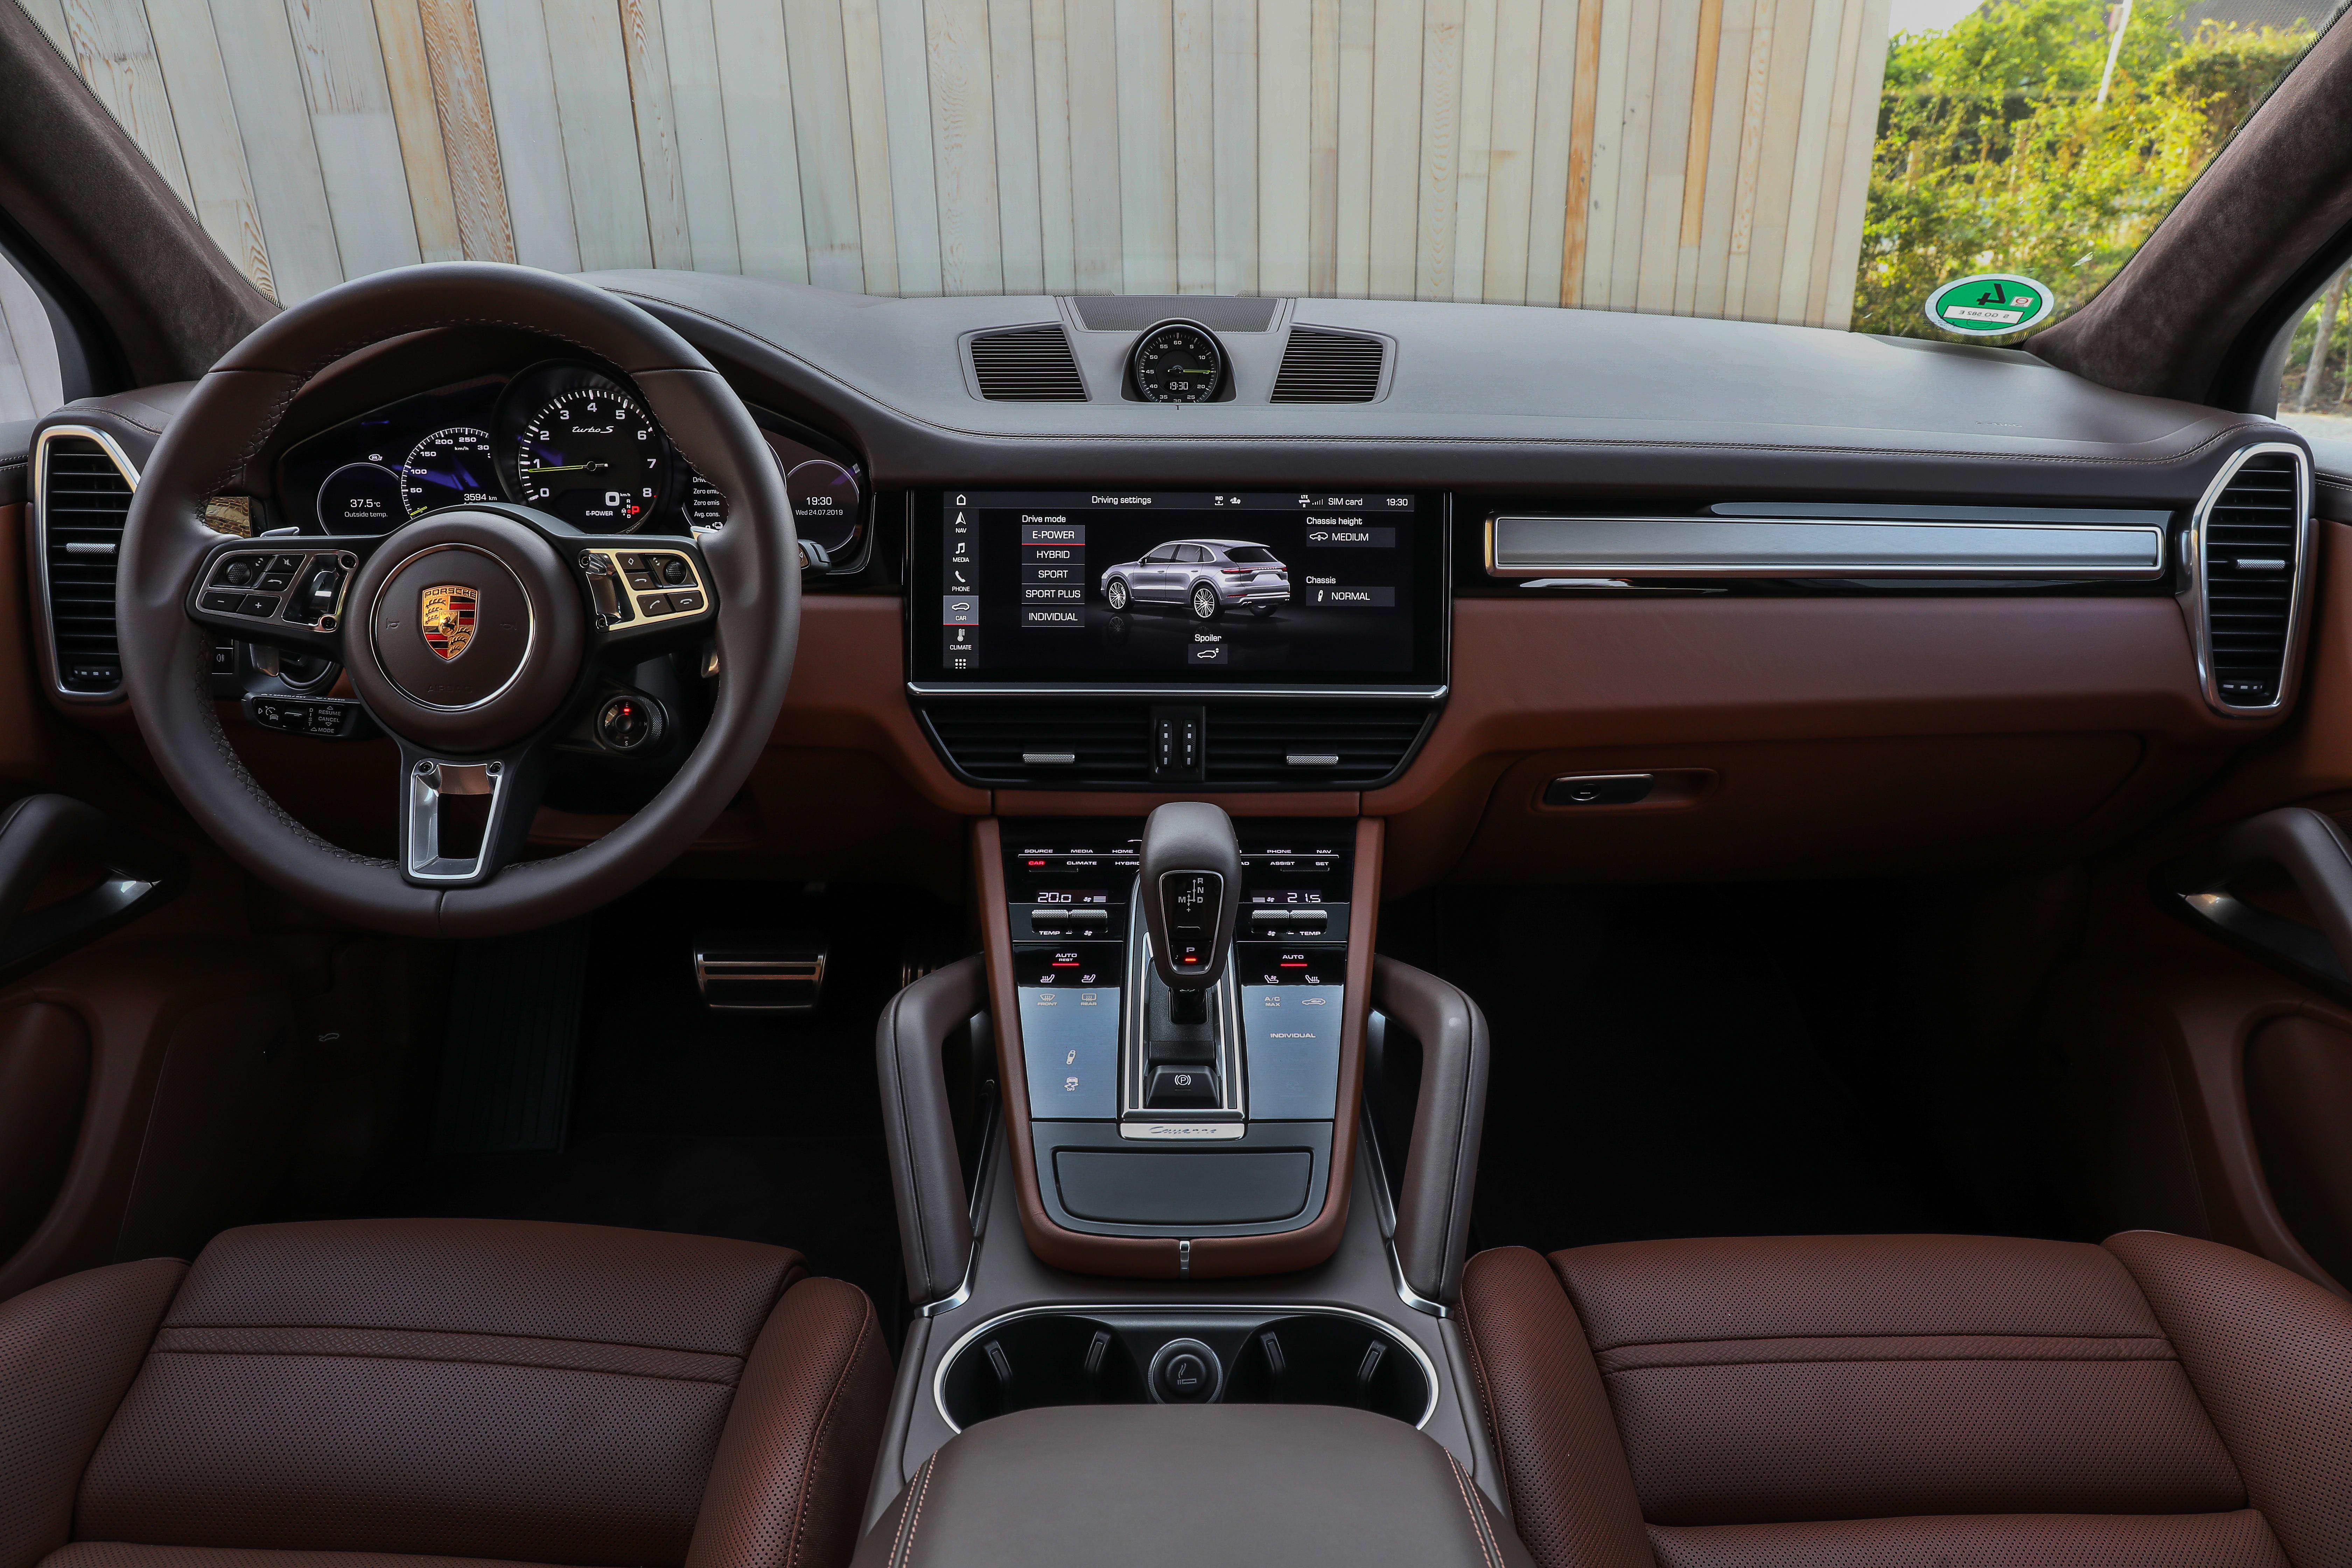 2020 Porsche Cayenne Turbo S E Hybrid Pricing And Specs Caradvice